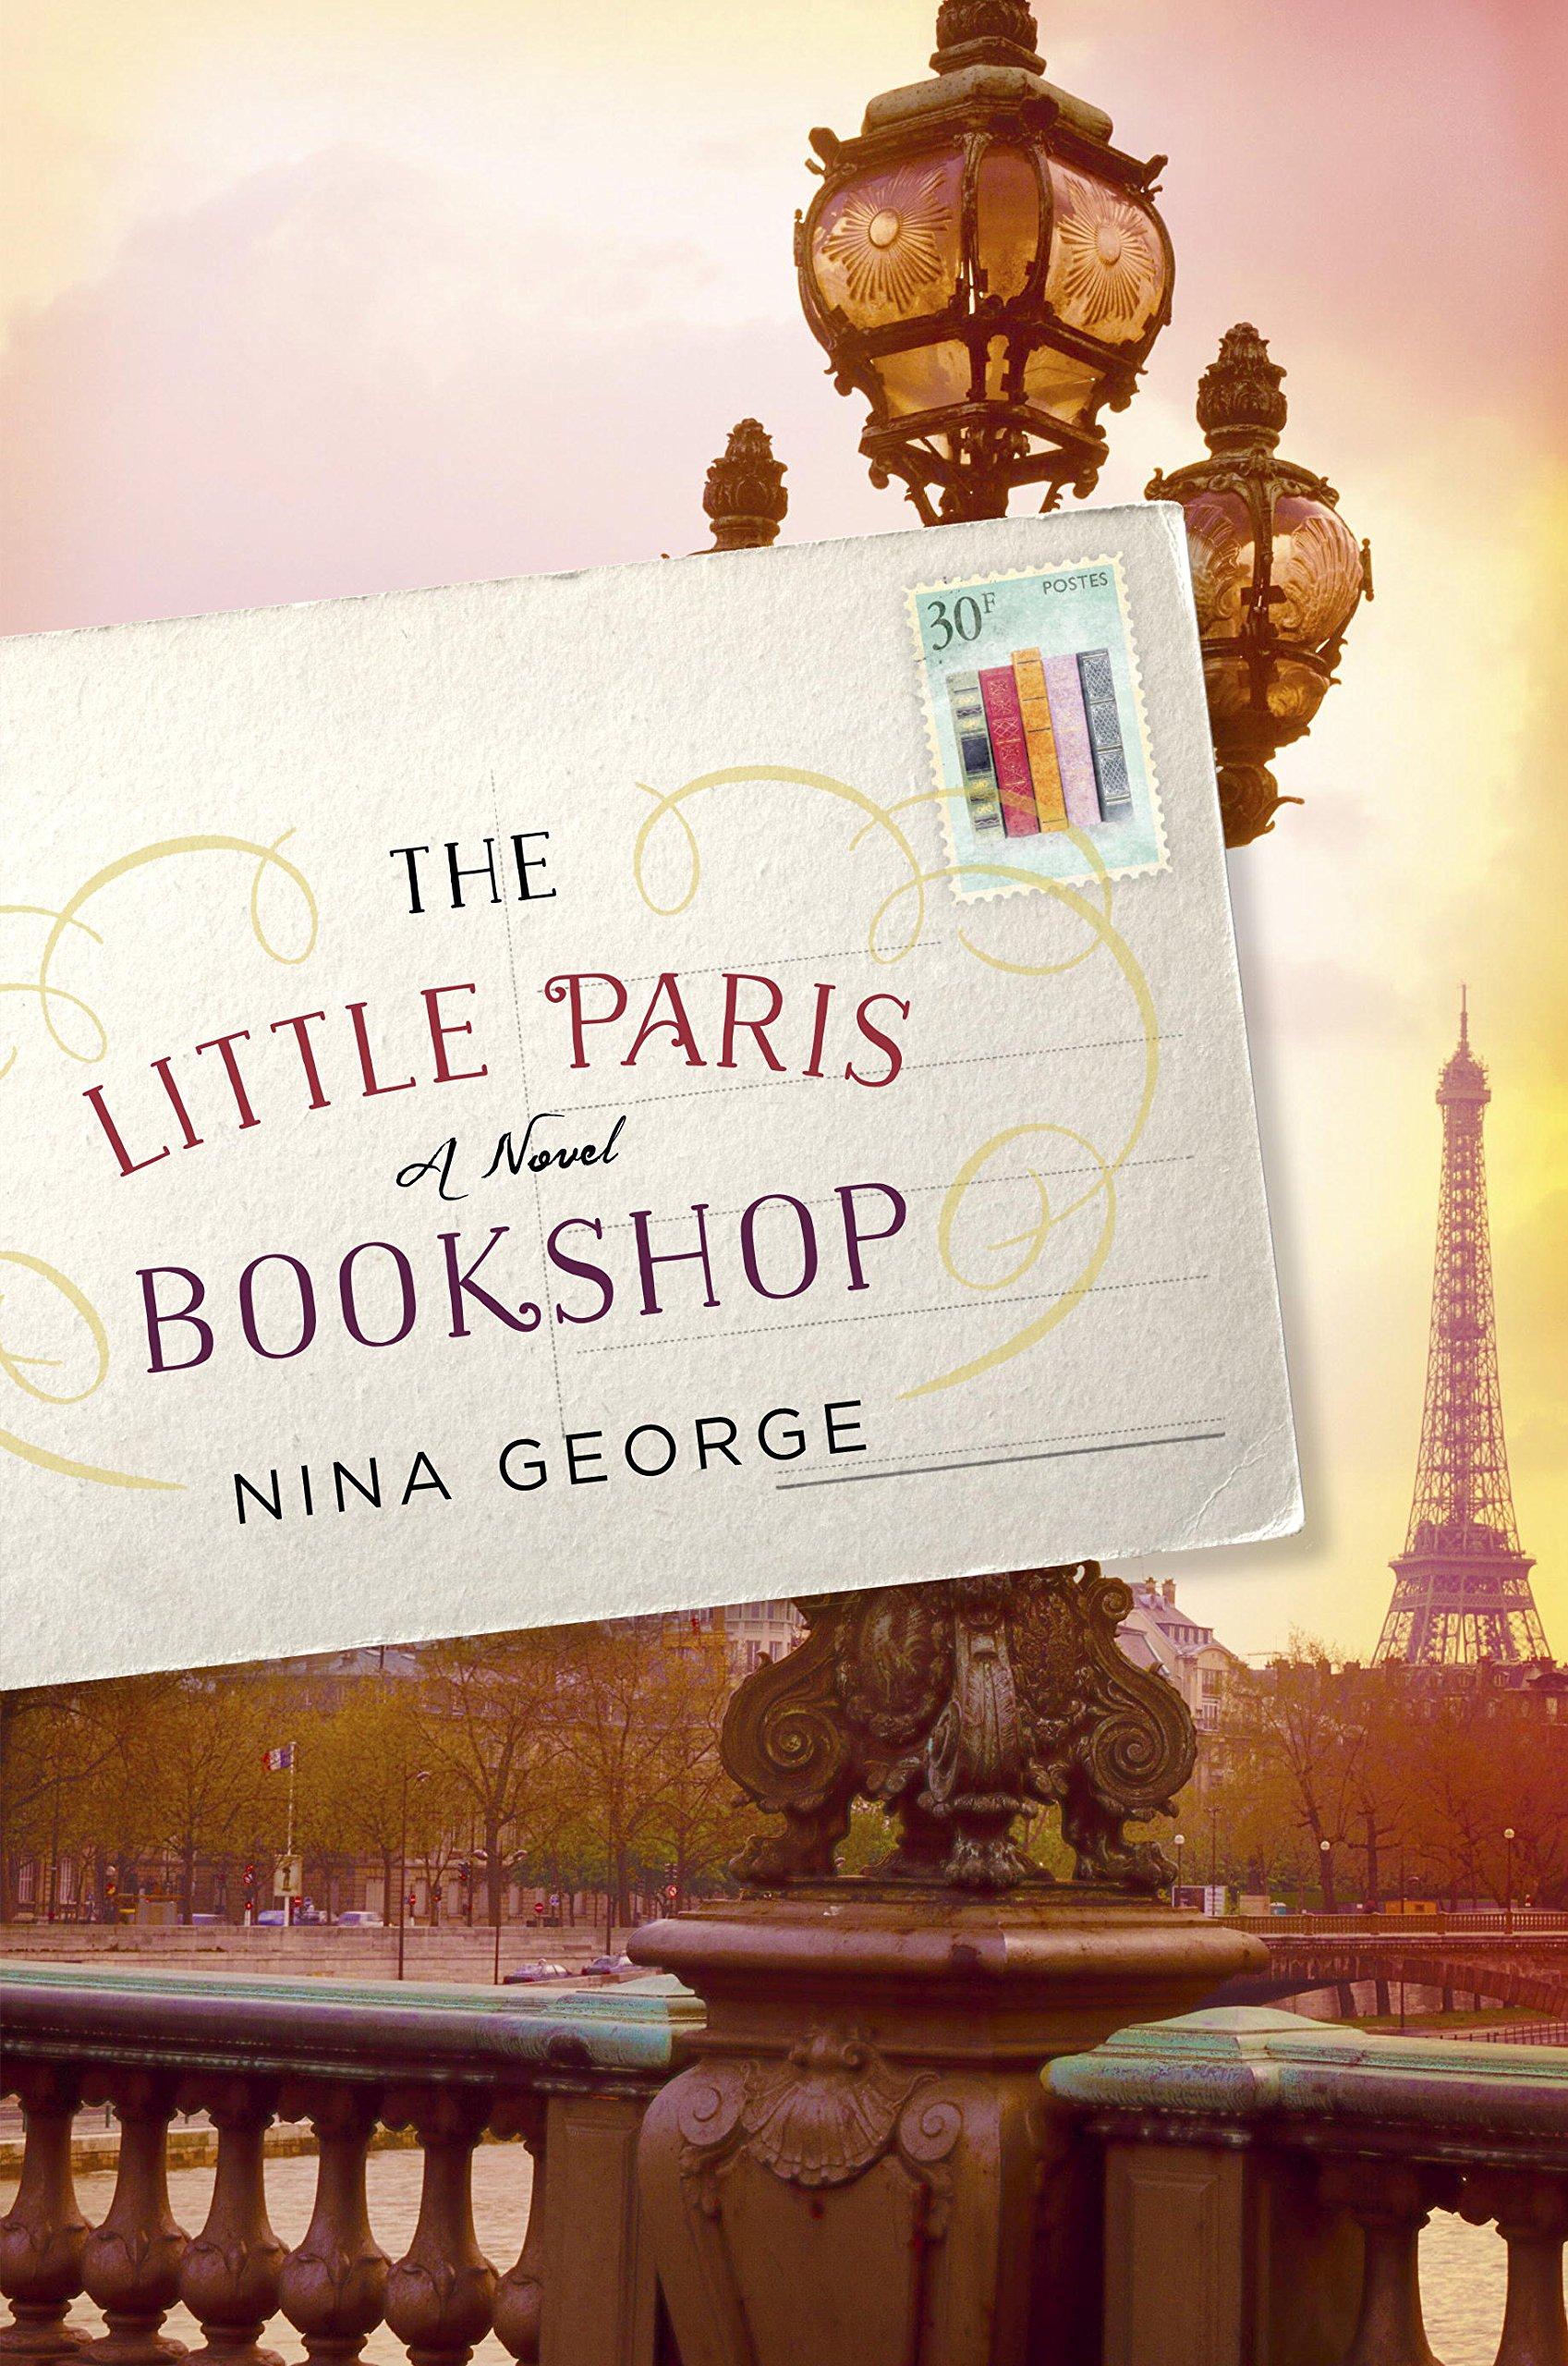 the little paris bookshop by nina george.jpg